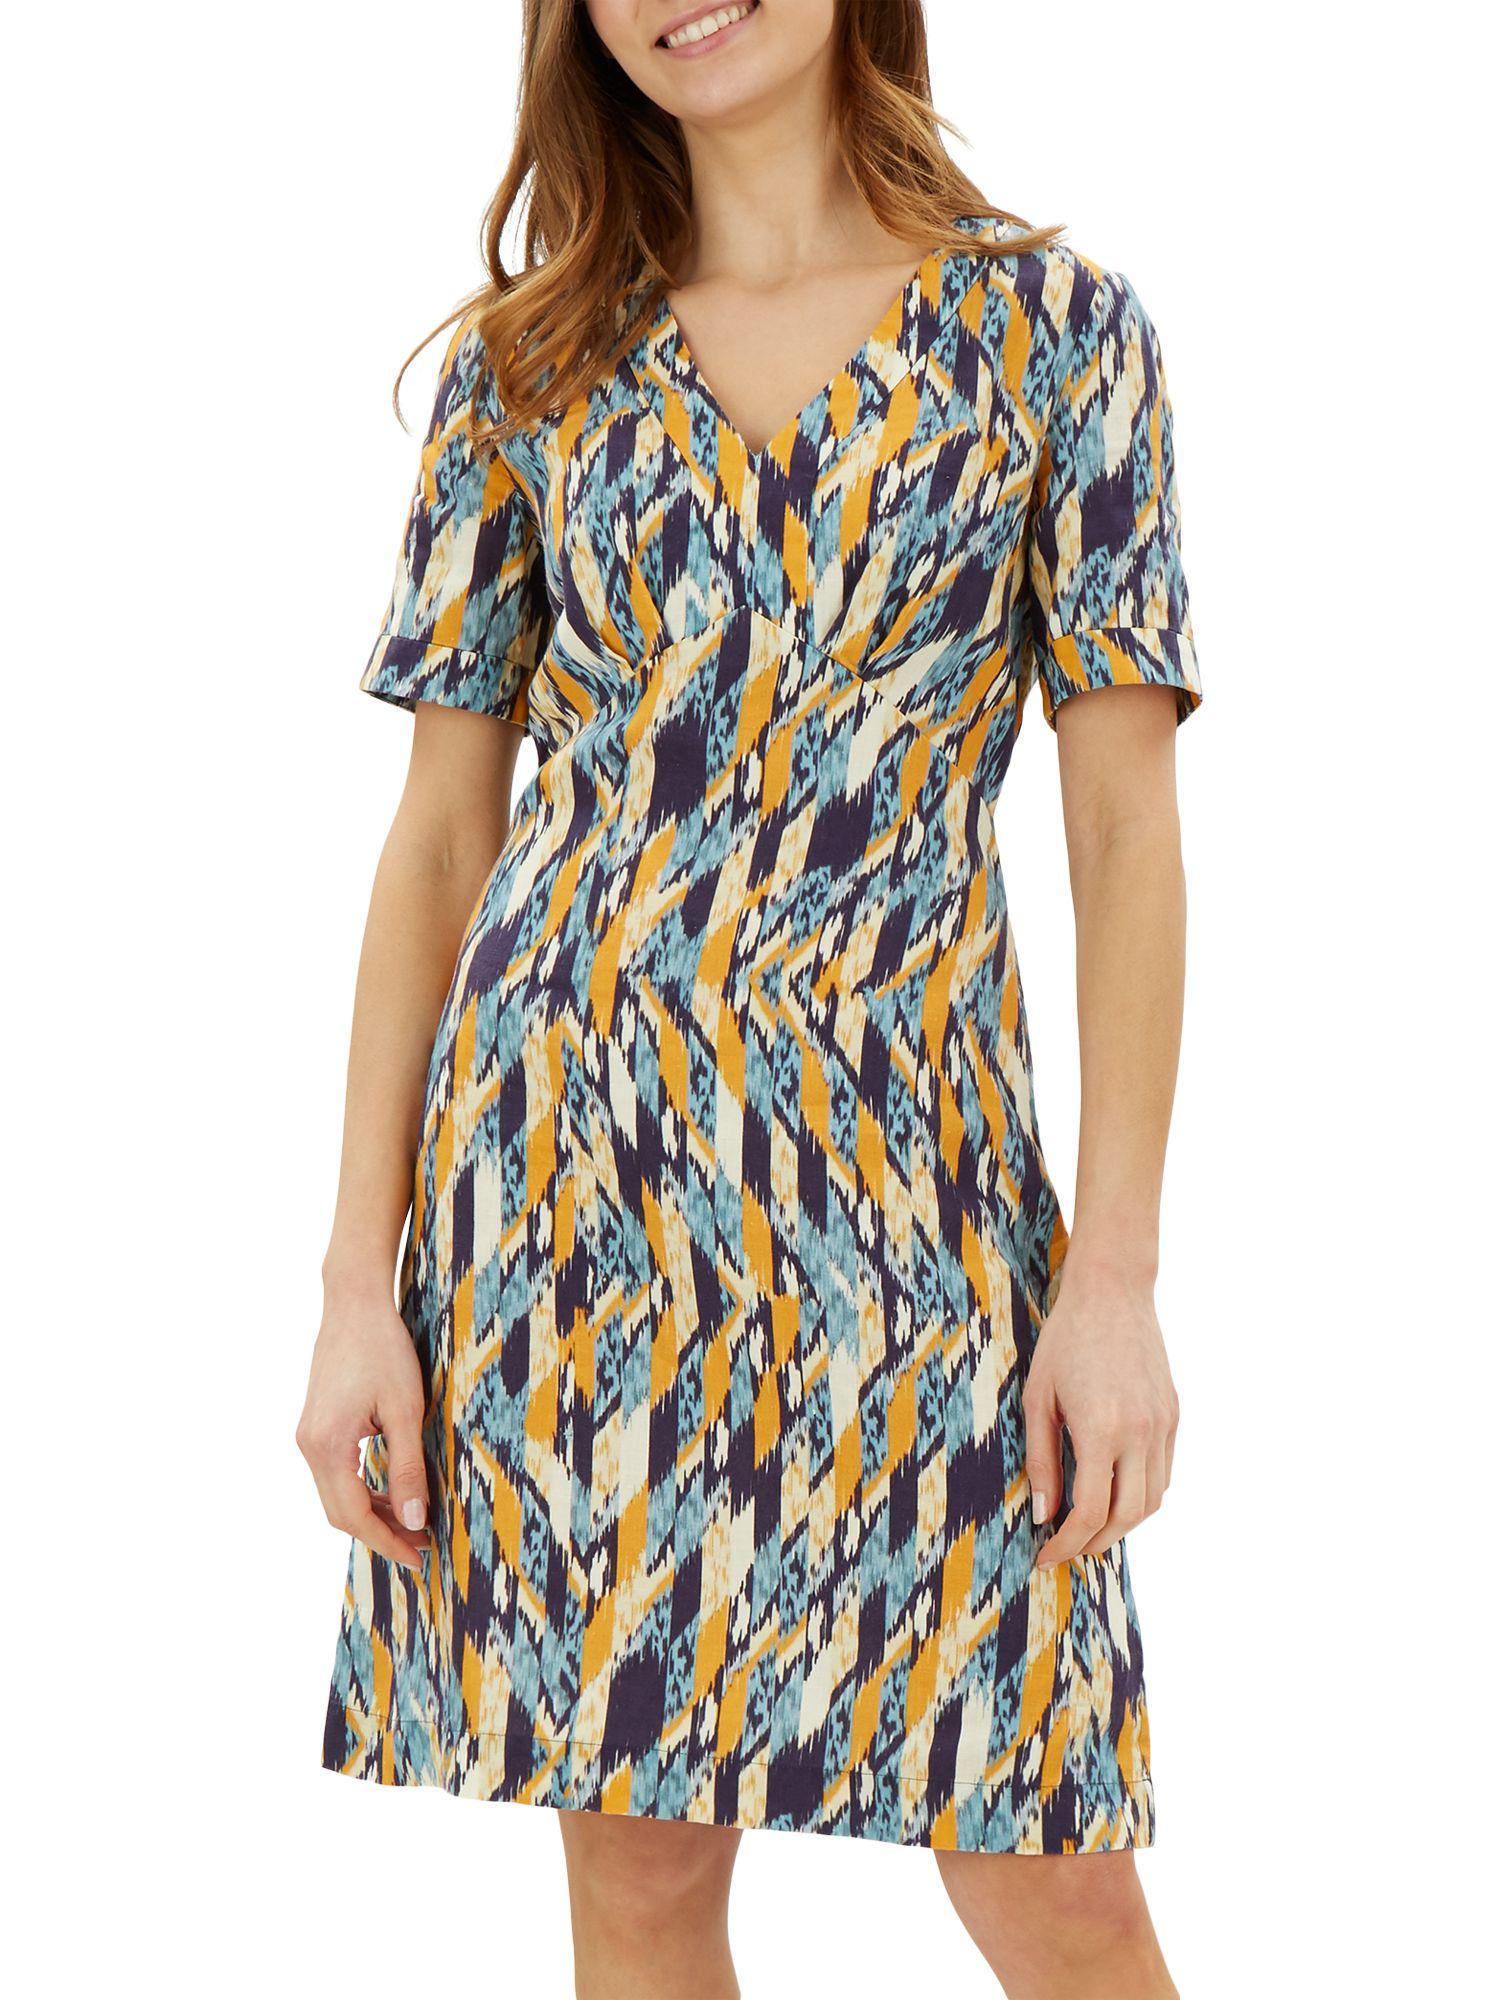 Jaeger Abstract Linen Dress in Blue - Lyst 42613e43f